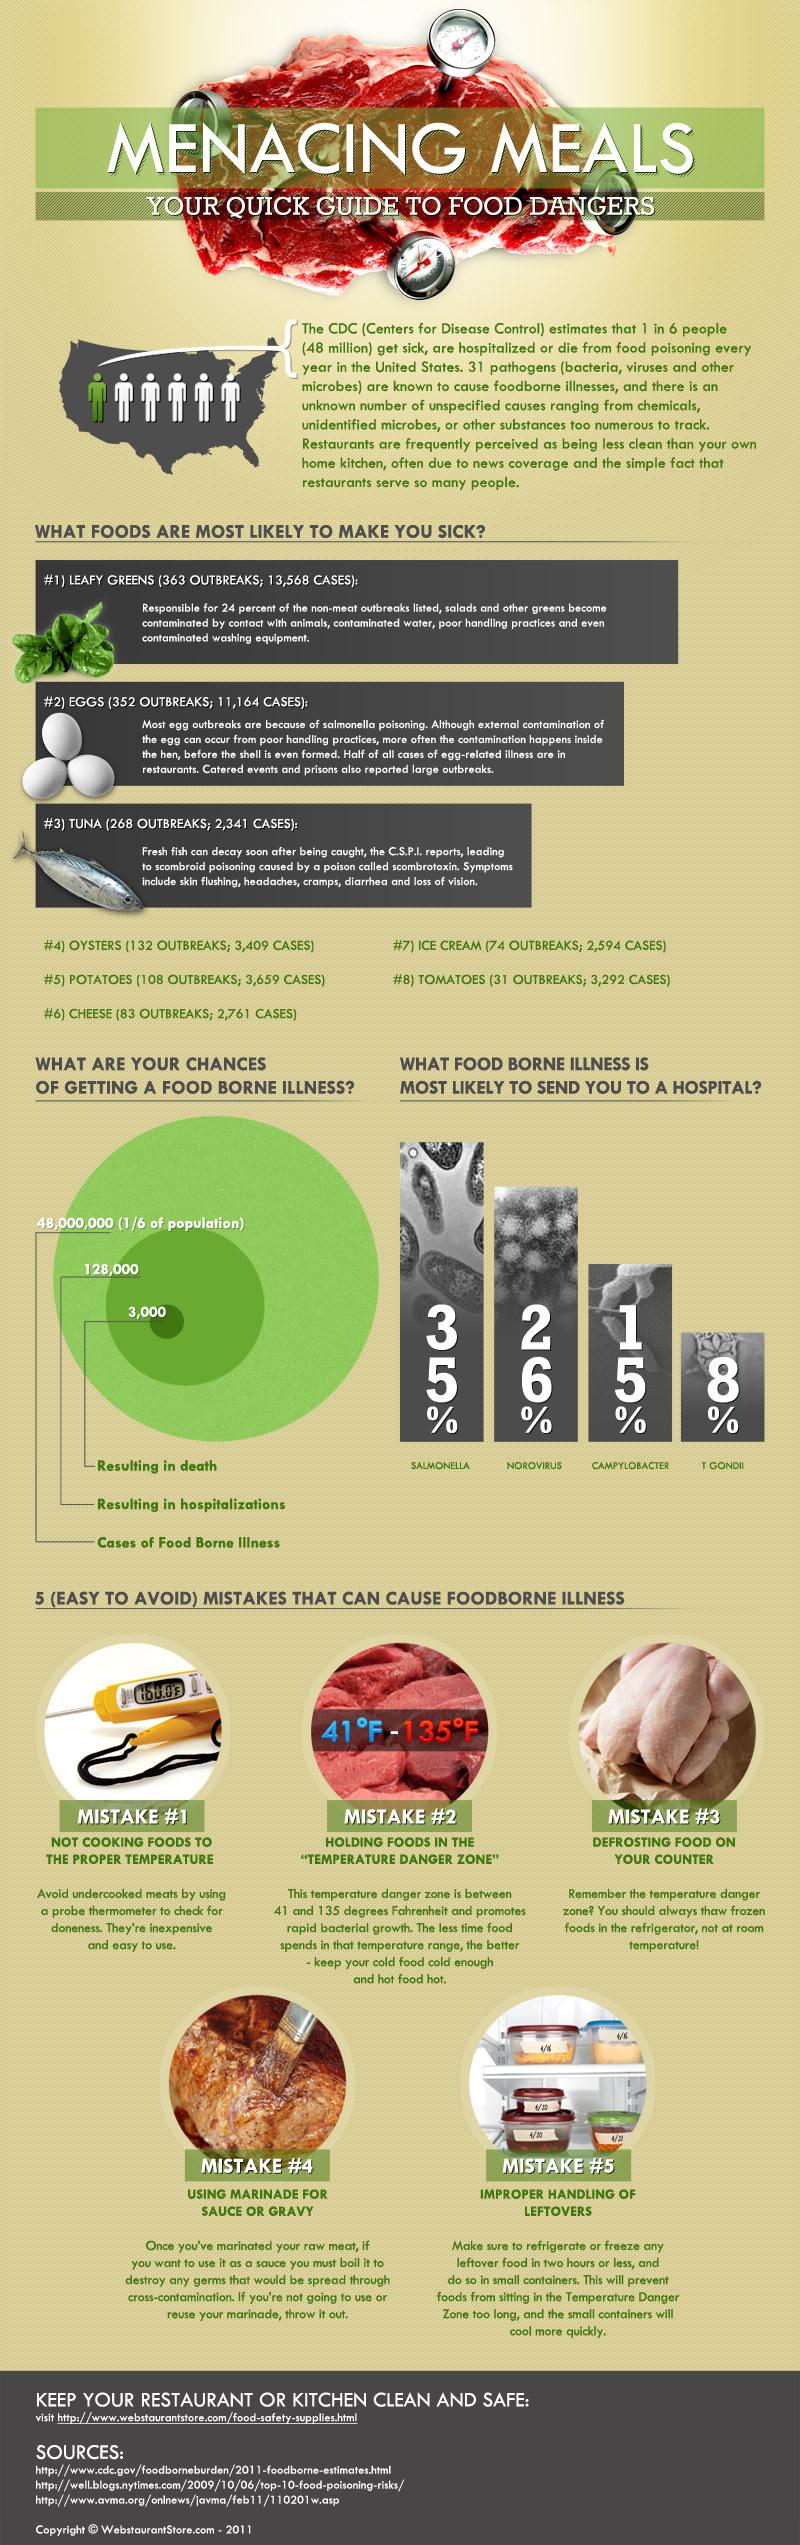 Menacing Meals Infographic